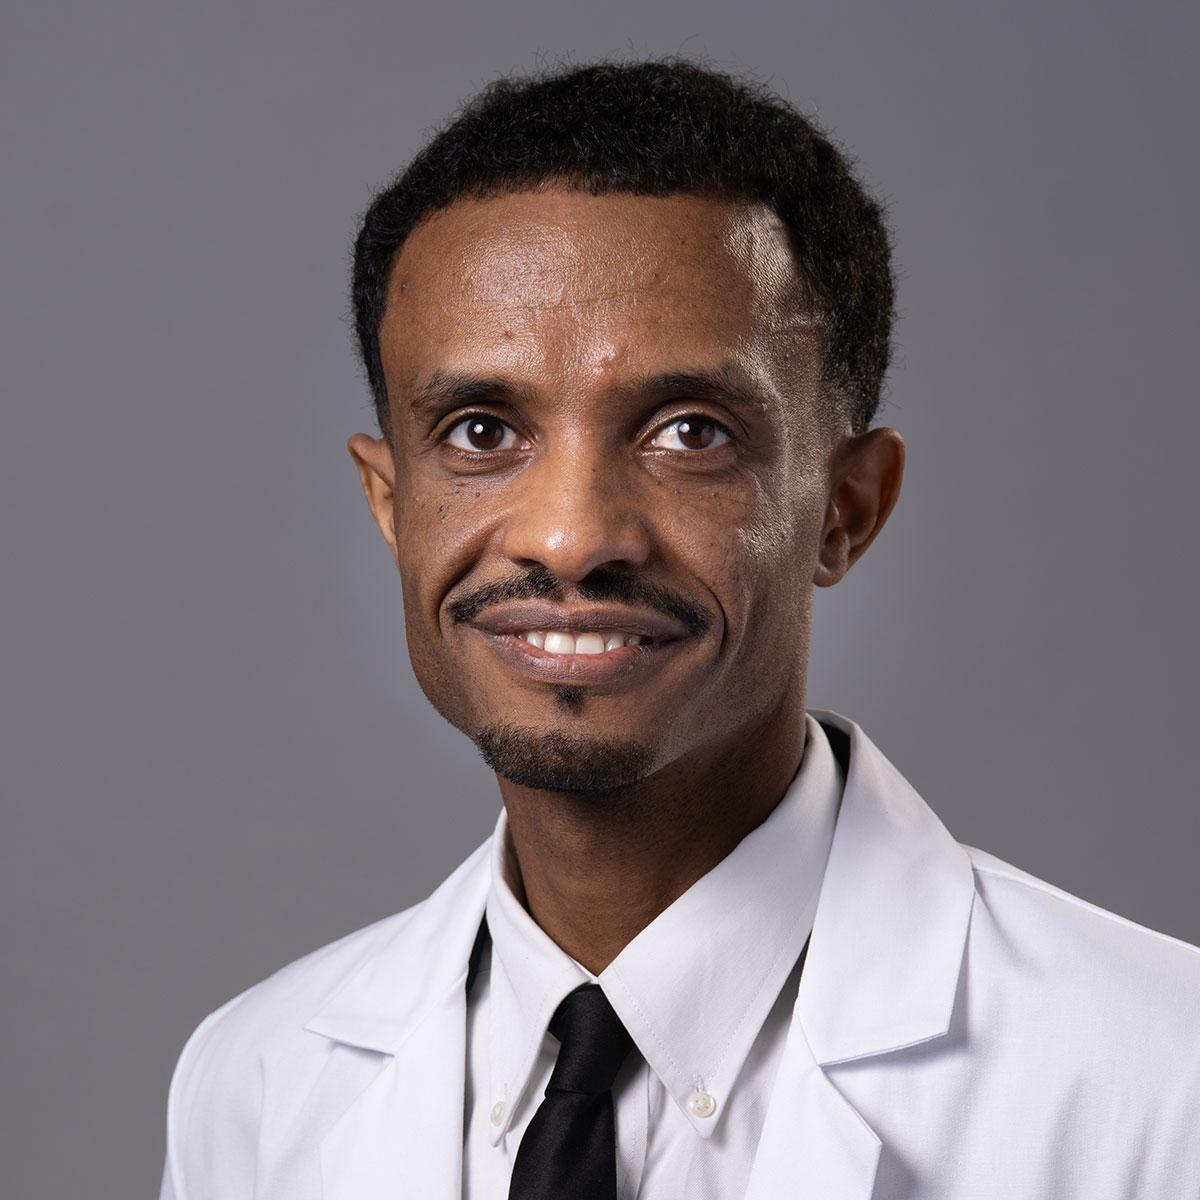 A friendly headshot of Dr. Tamene Yonas